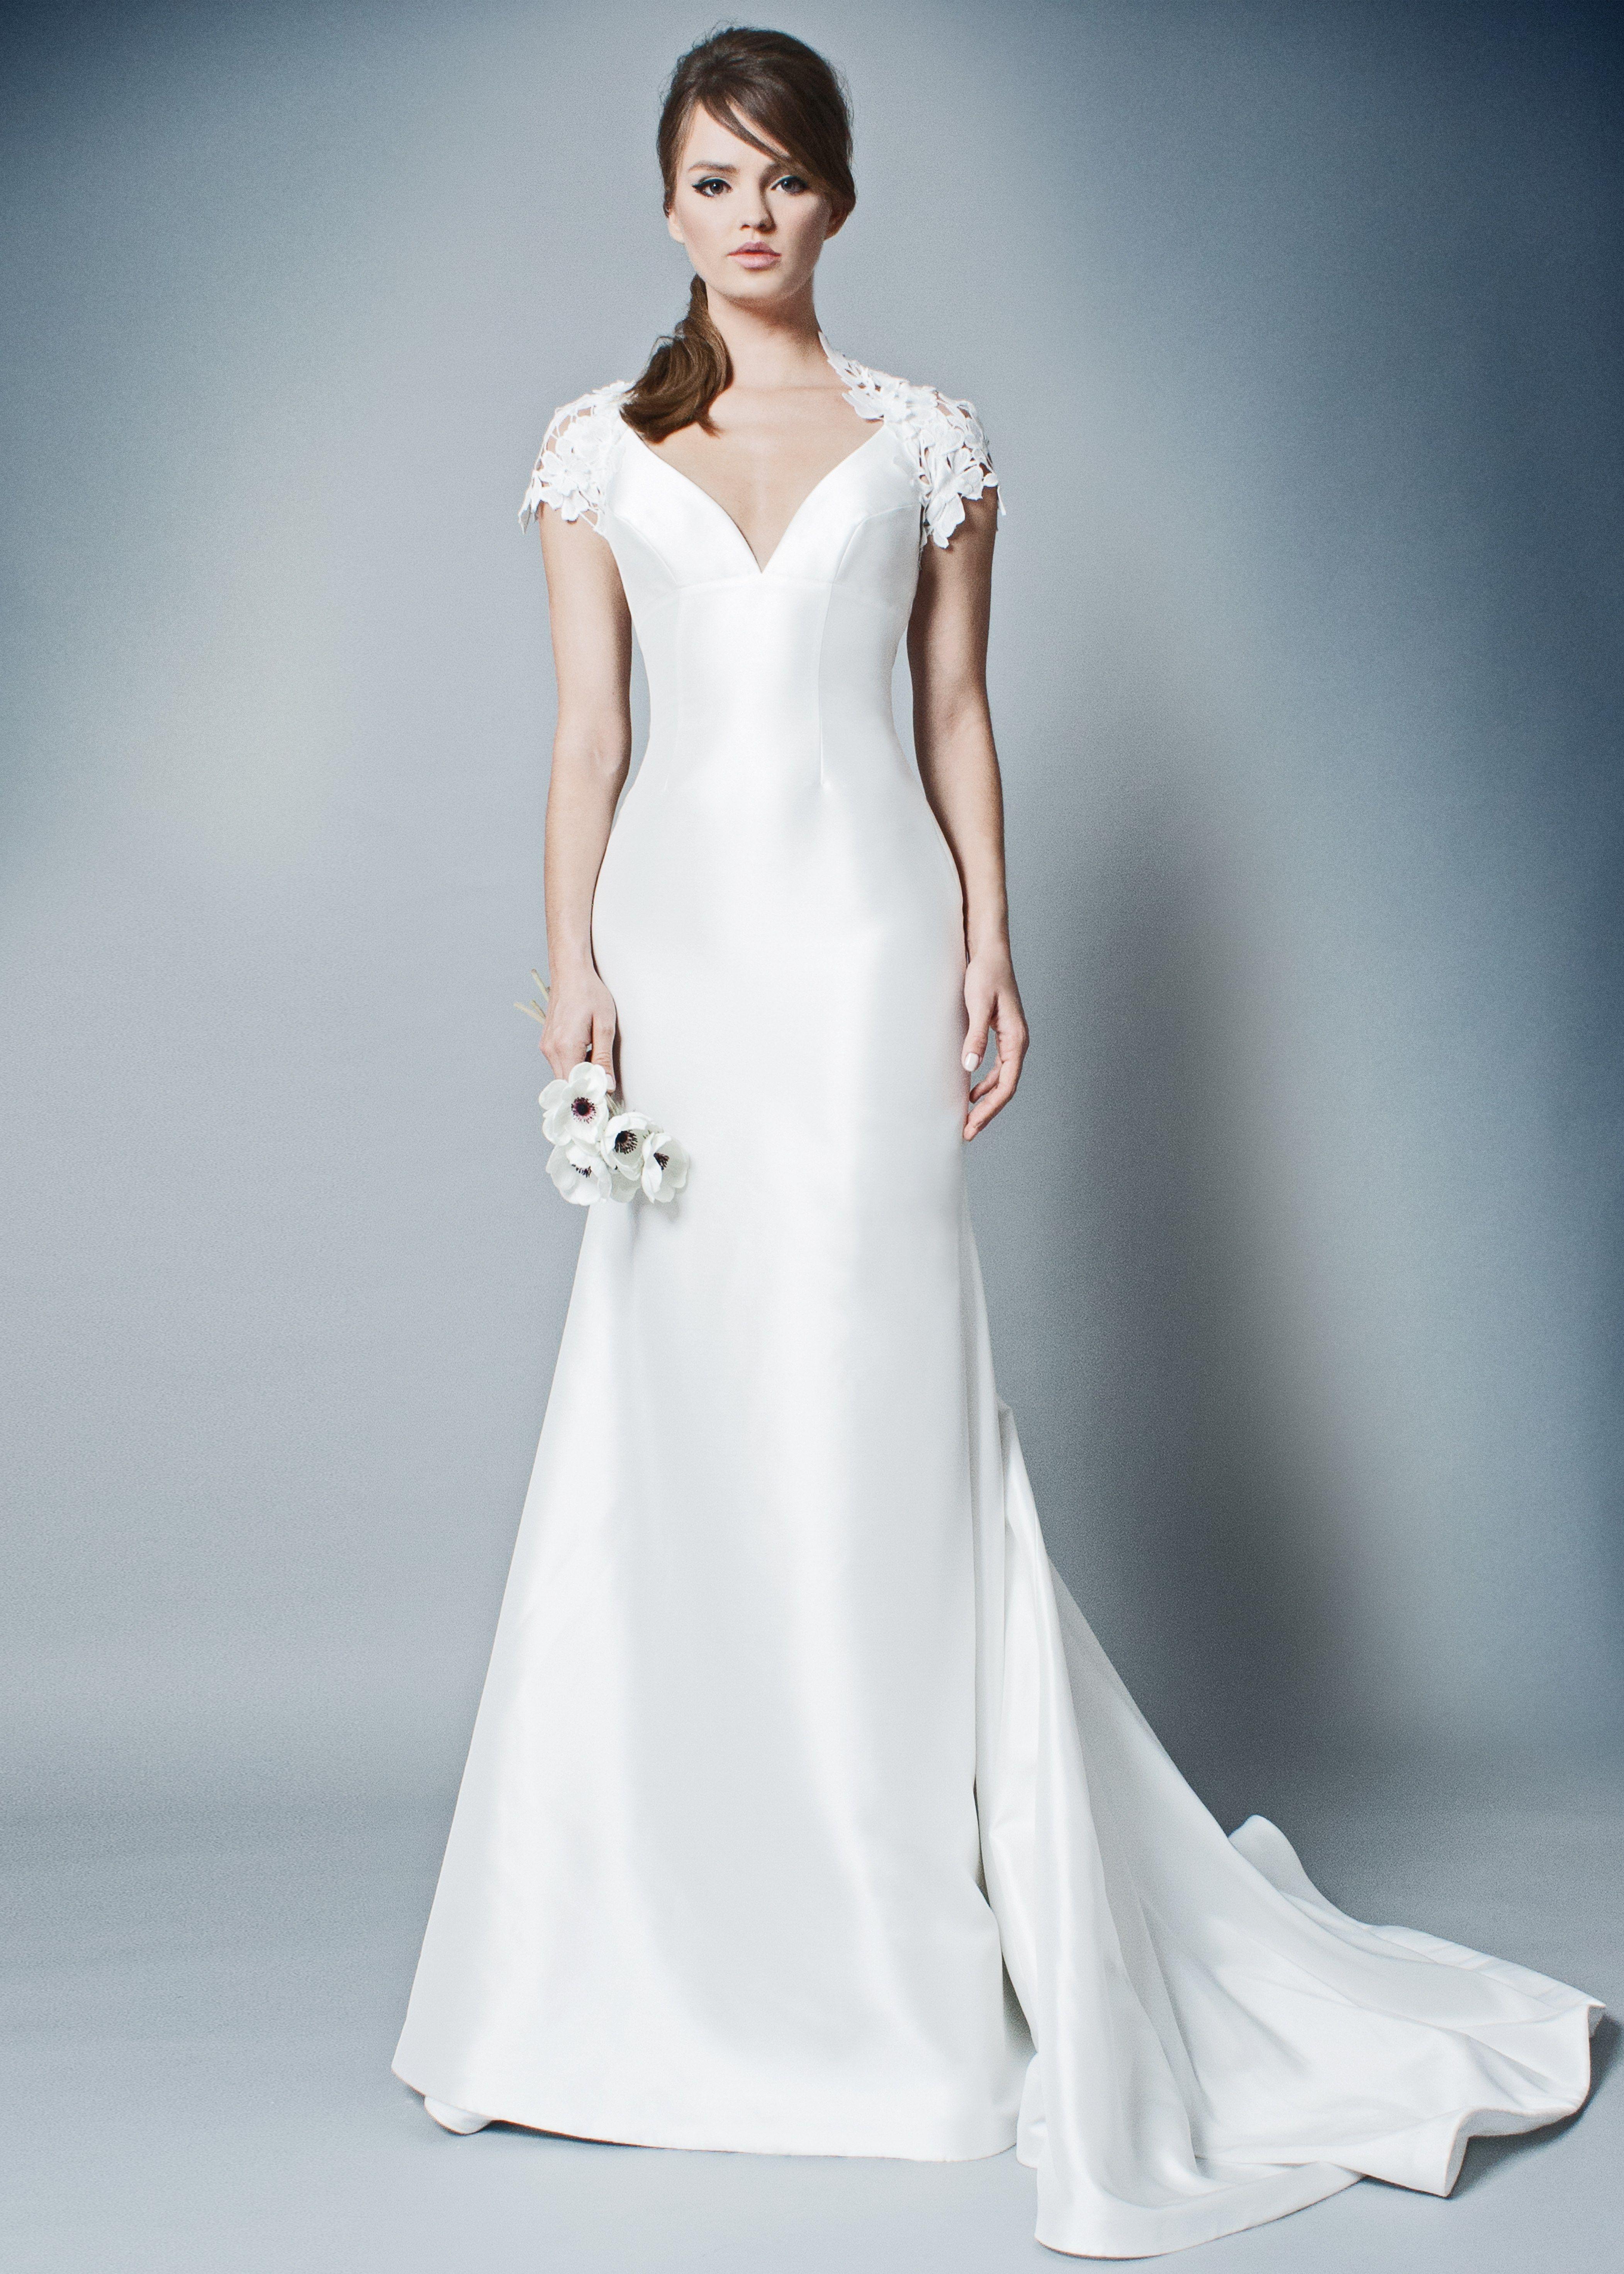 Nett Vestidos De Novias Auslass Fotos - Brautkleider Ideen ...